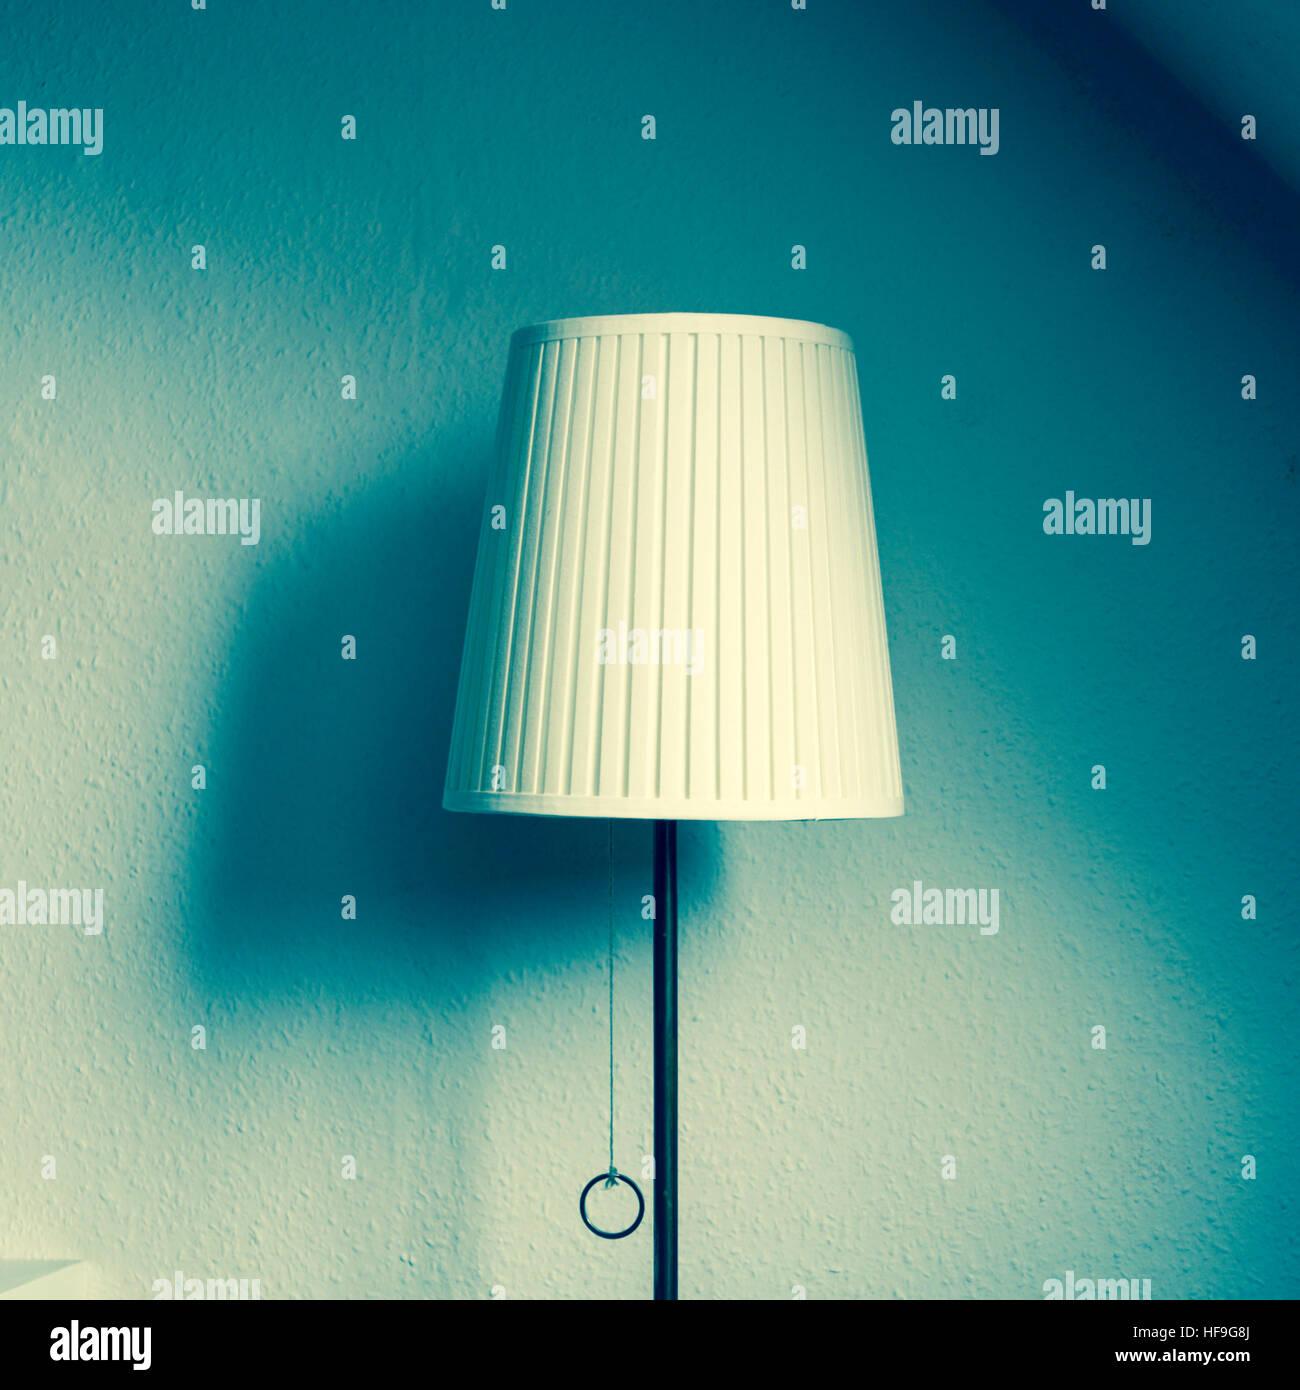 Retro lampshade - Stock Image